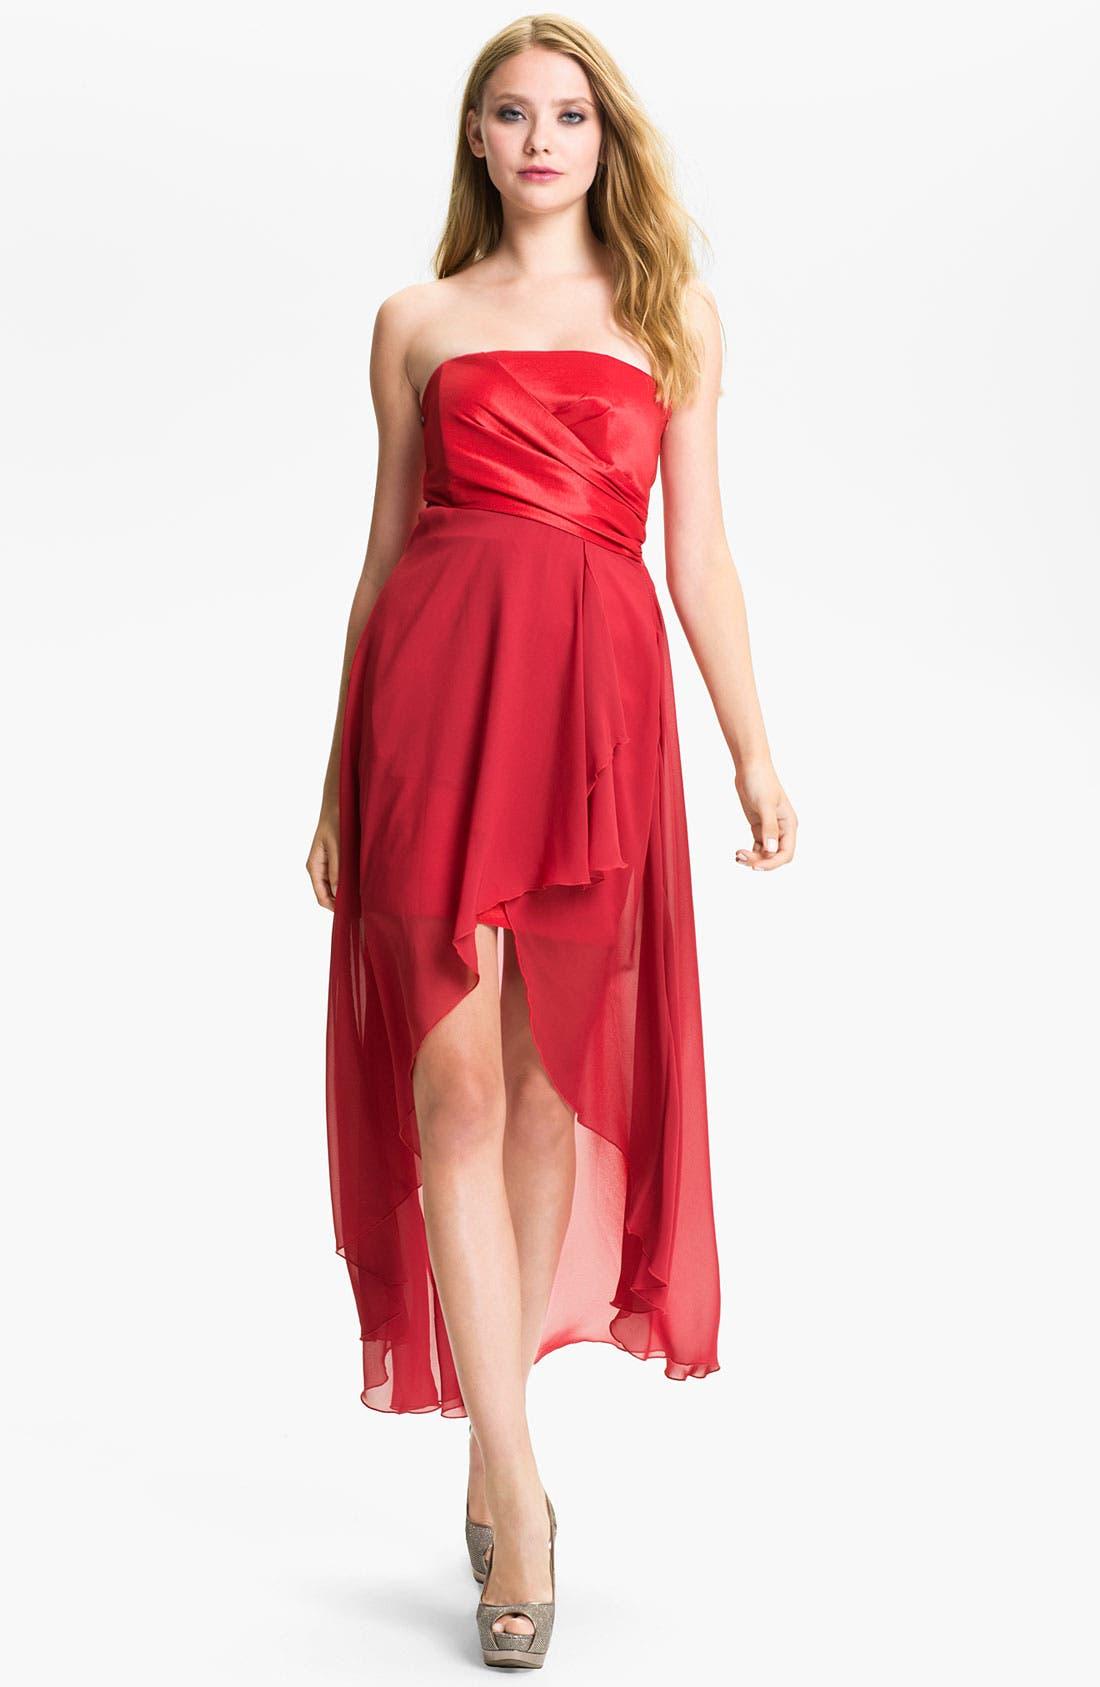 Alternate Image 1 Selected - Jessica McClintock Strapless Taffeta & Chiffon High/Low Dress